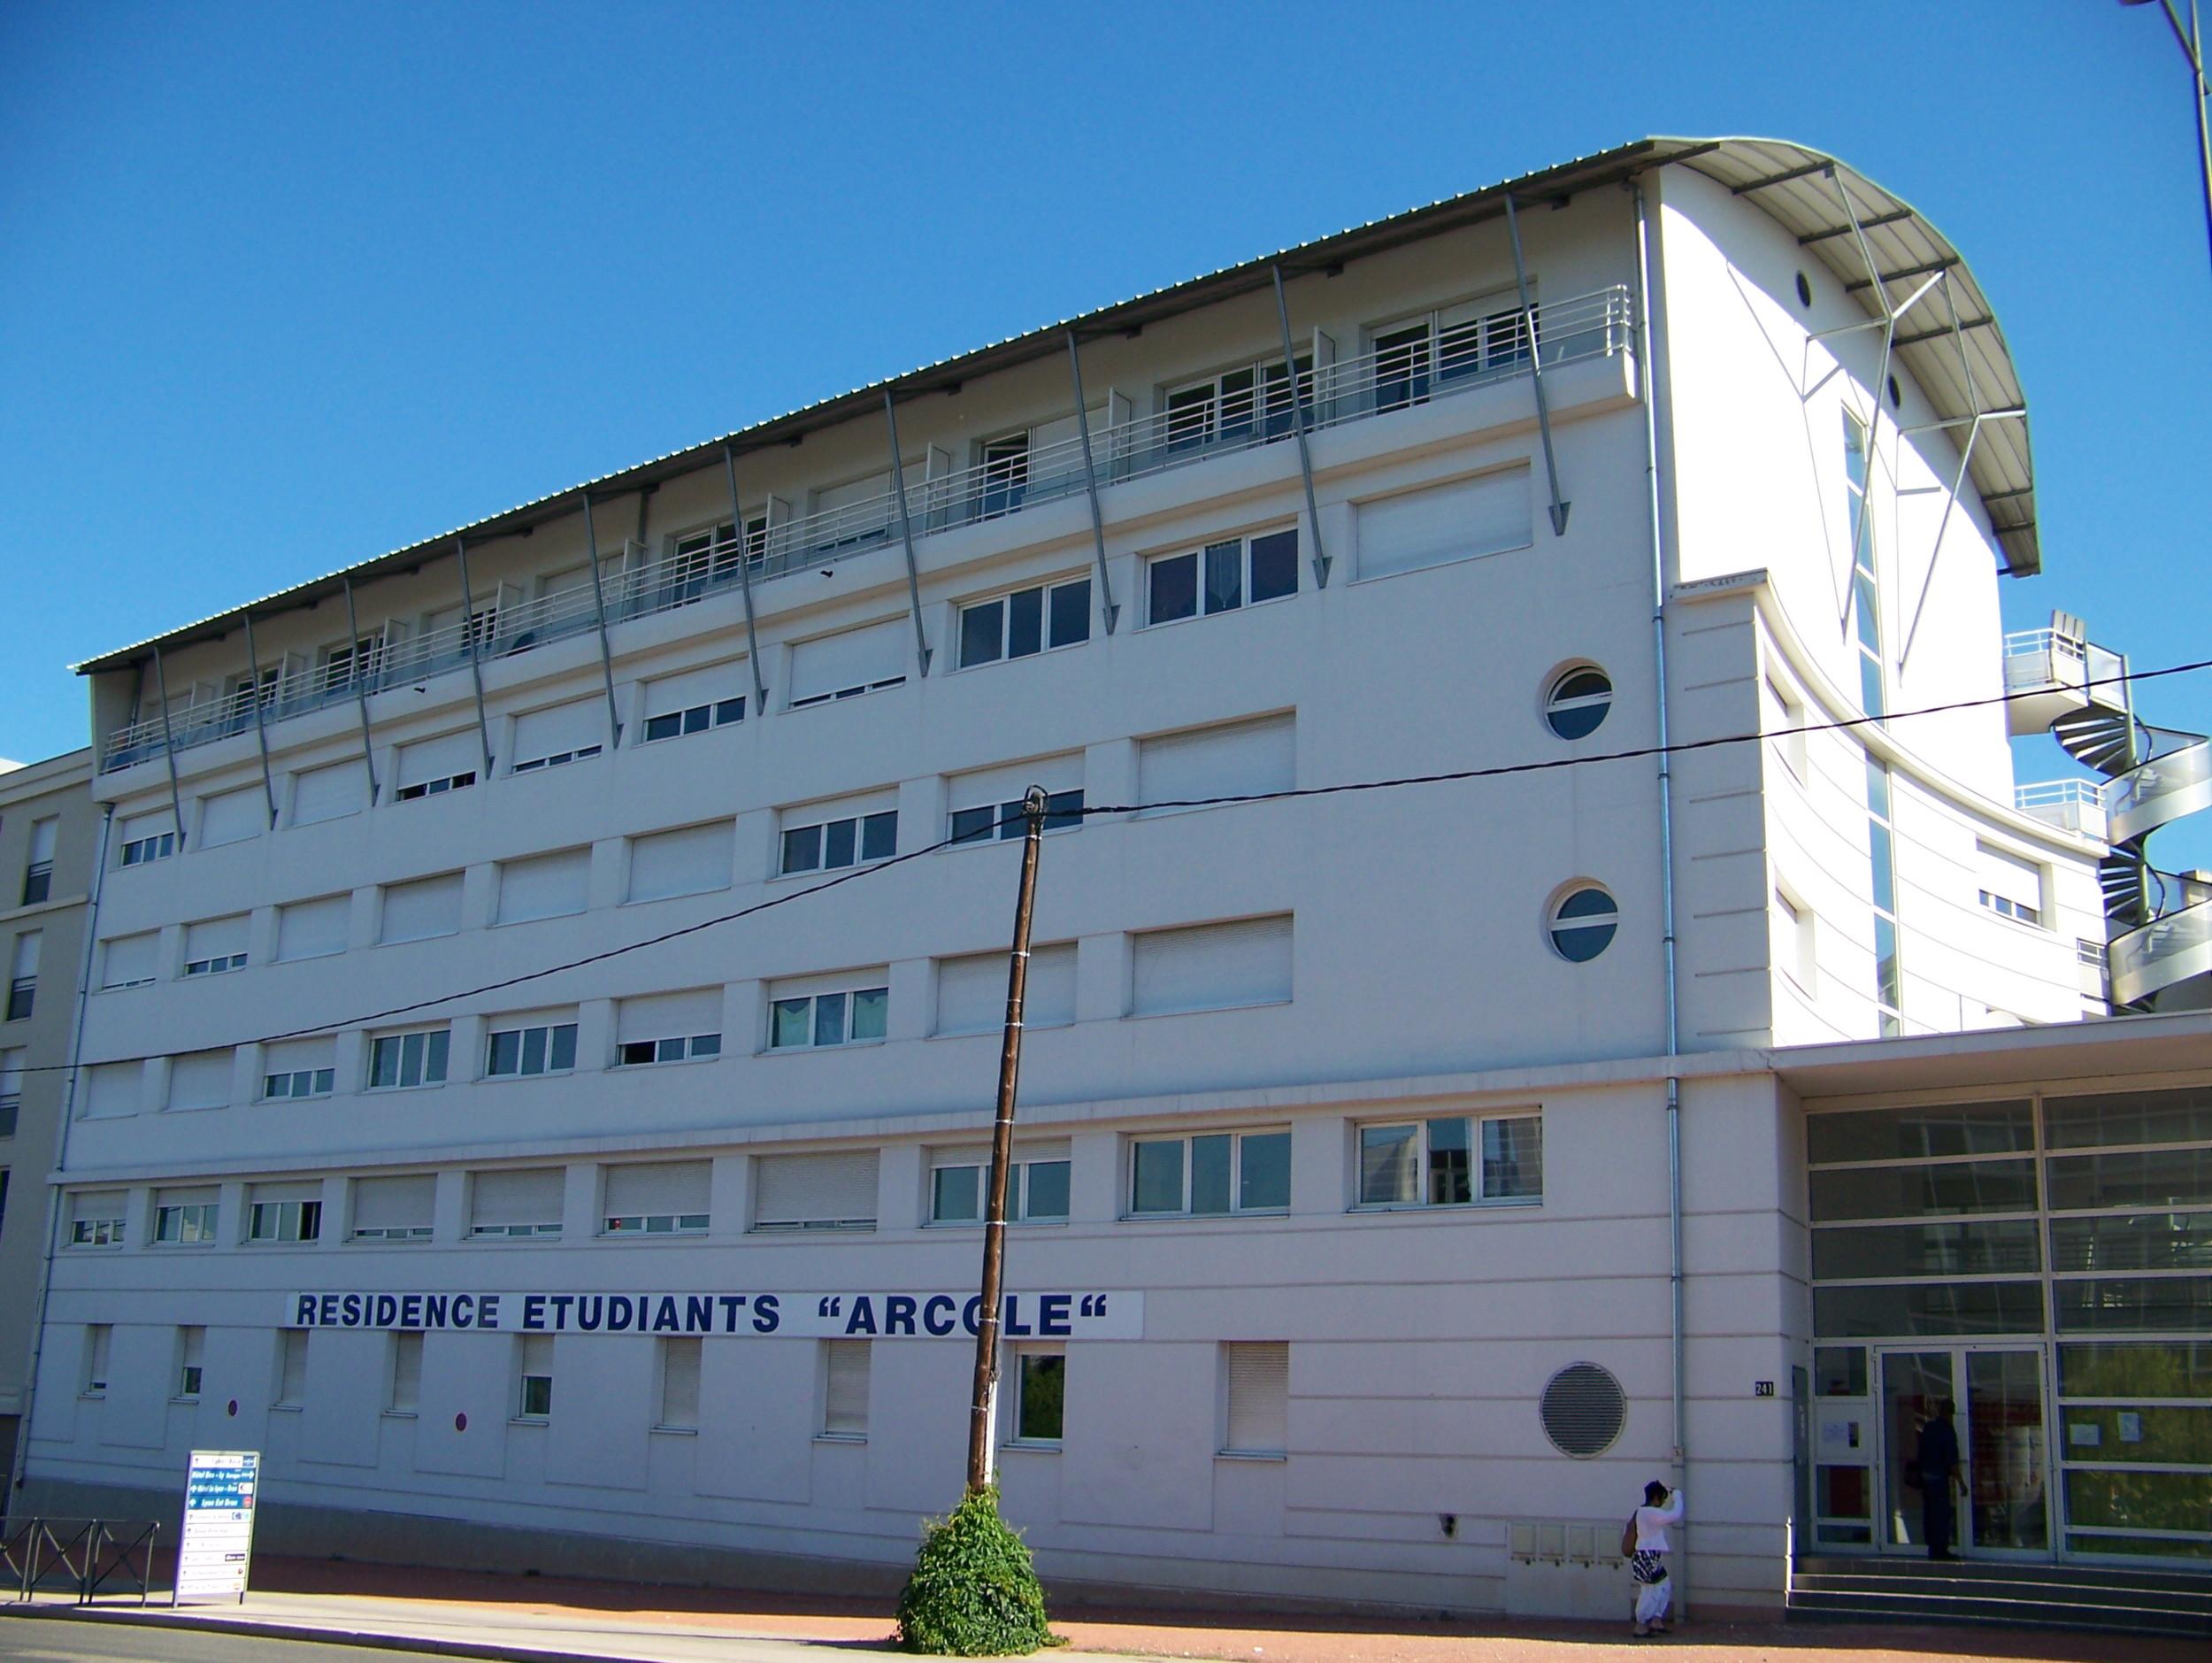 Location CARDINAL CAMPUS - ARCOLE  - Bron (69500)